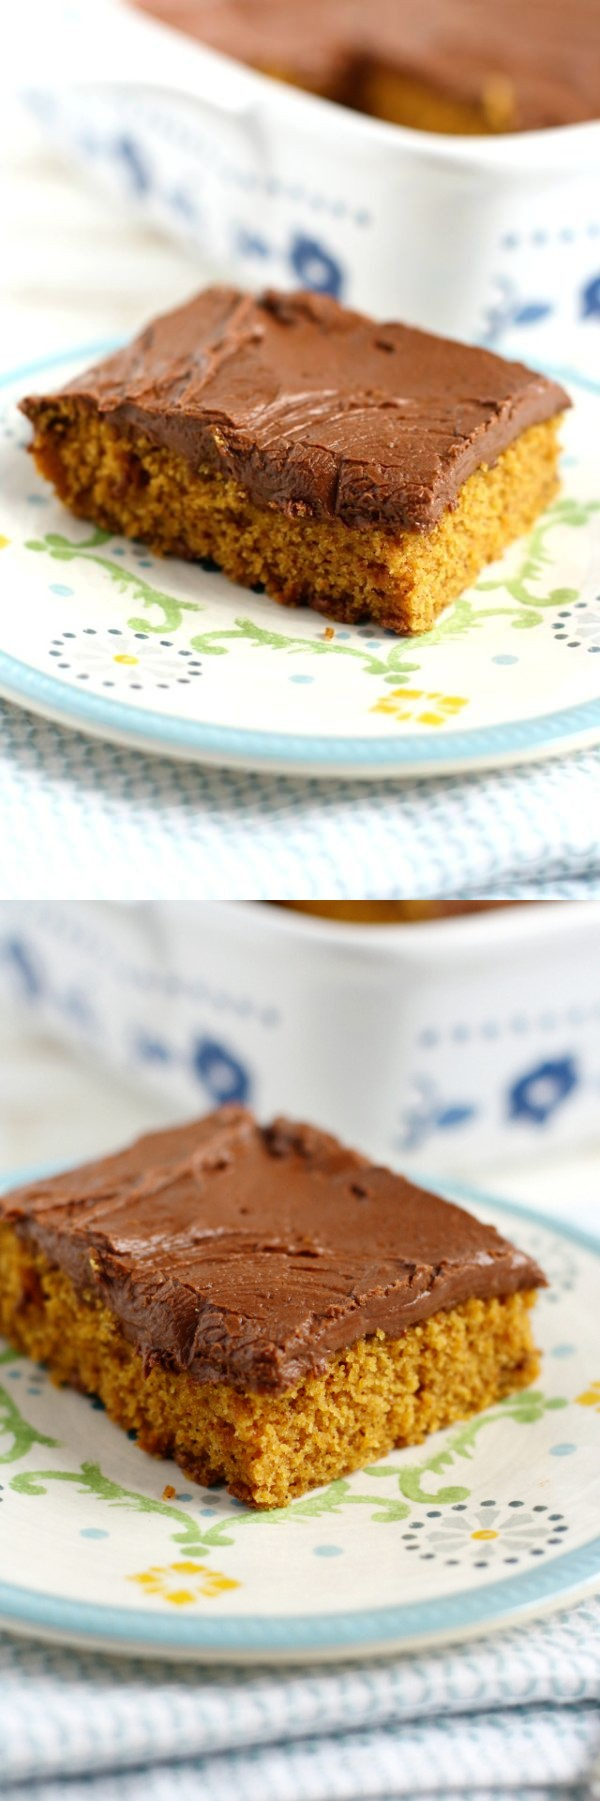 Pumpkin Sheet Cake with Chocolate Frosting (Vegan, Gluten Free